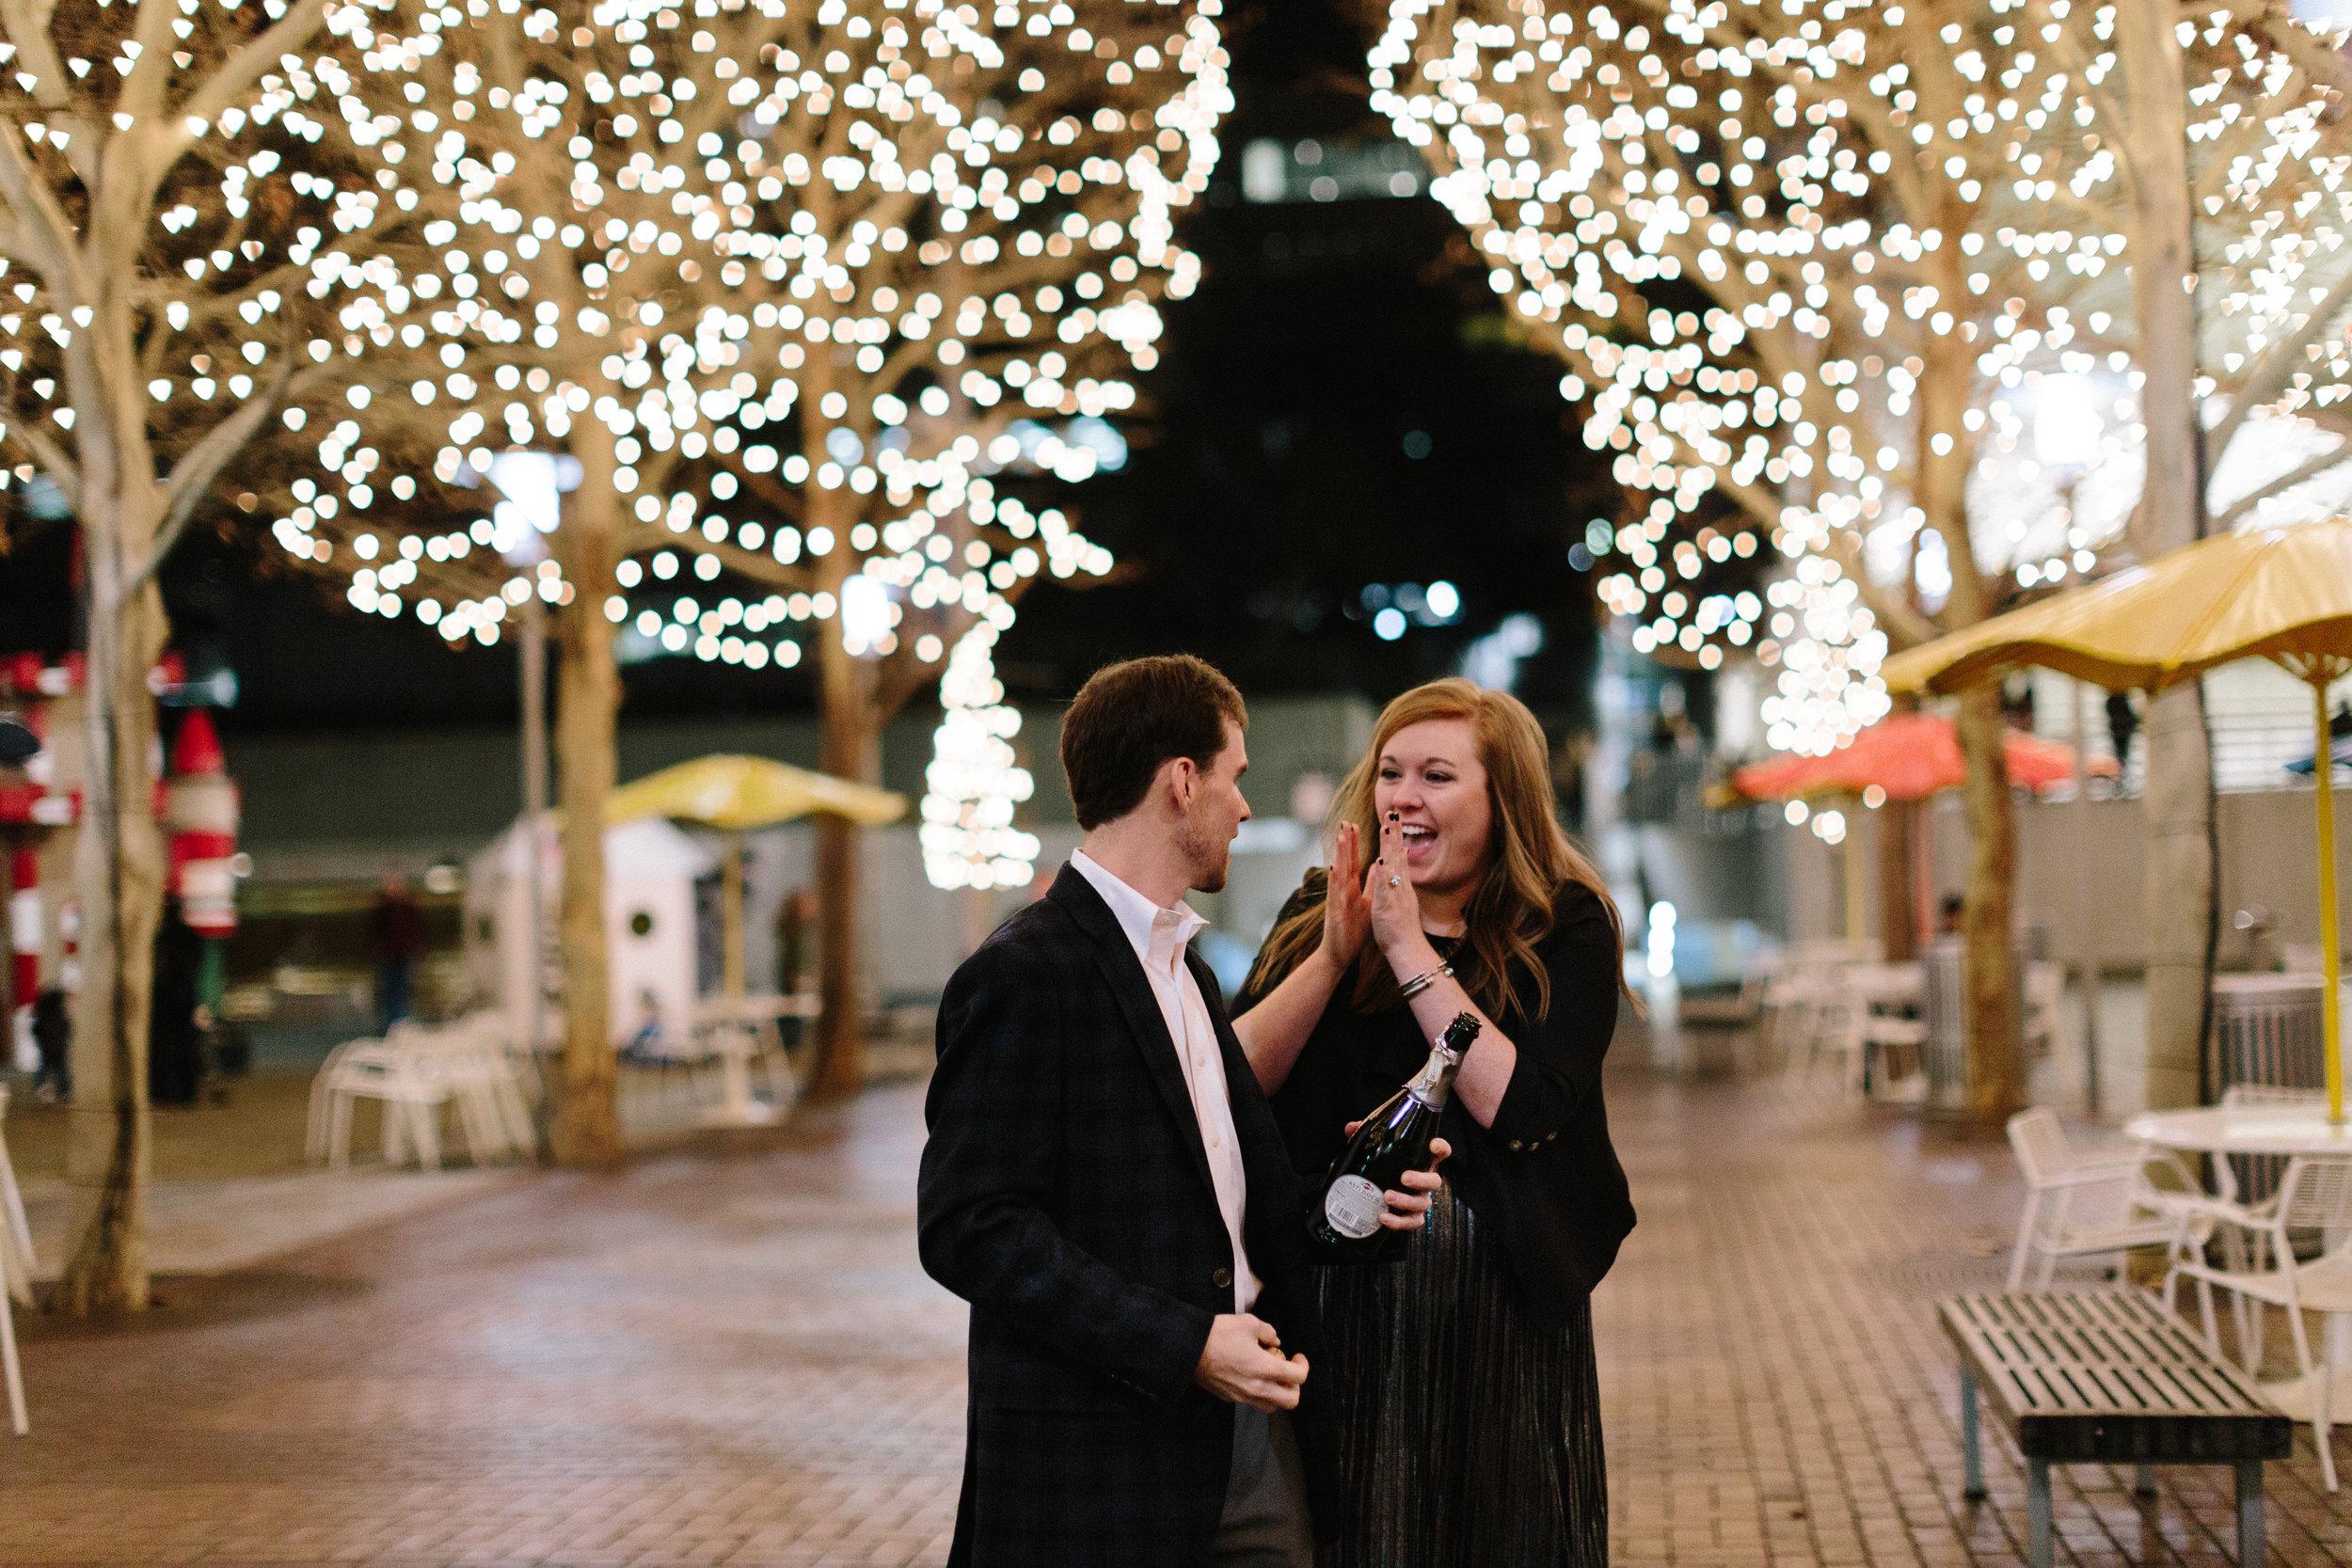 alyssa barletter photography crown center kansas city wedding proposal how he asked-5.jpg